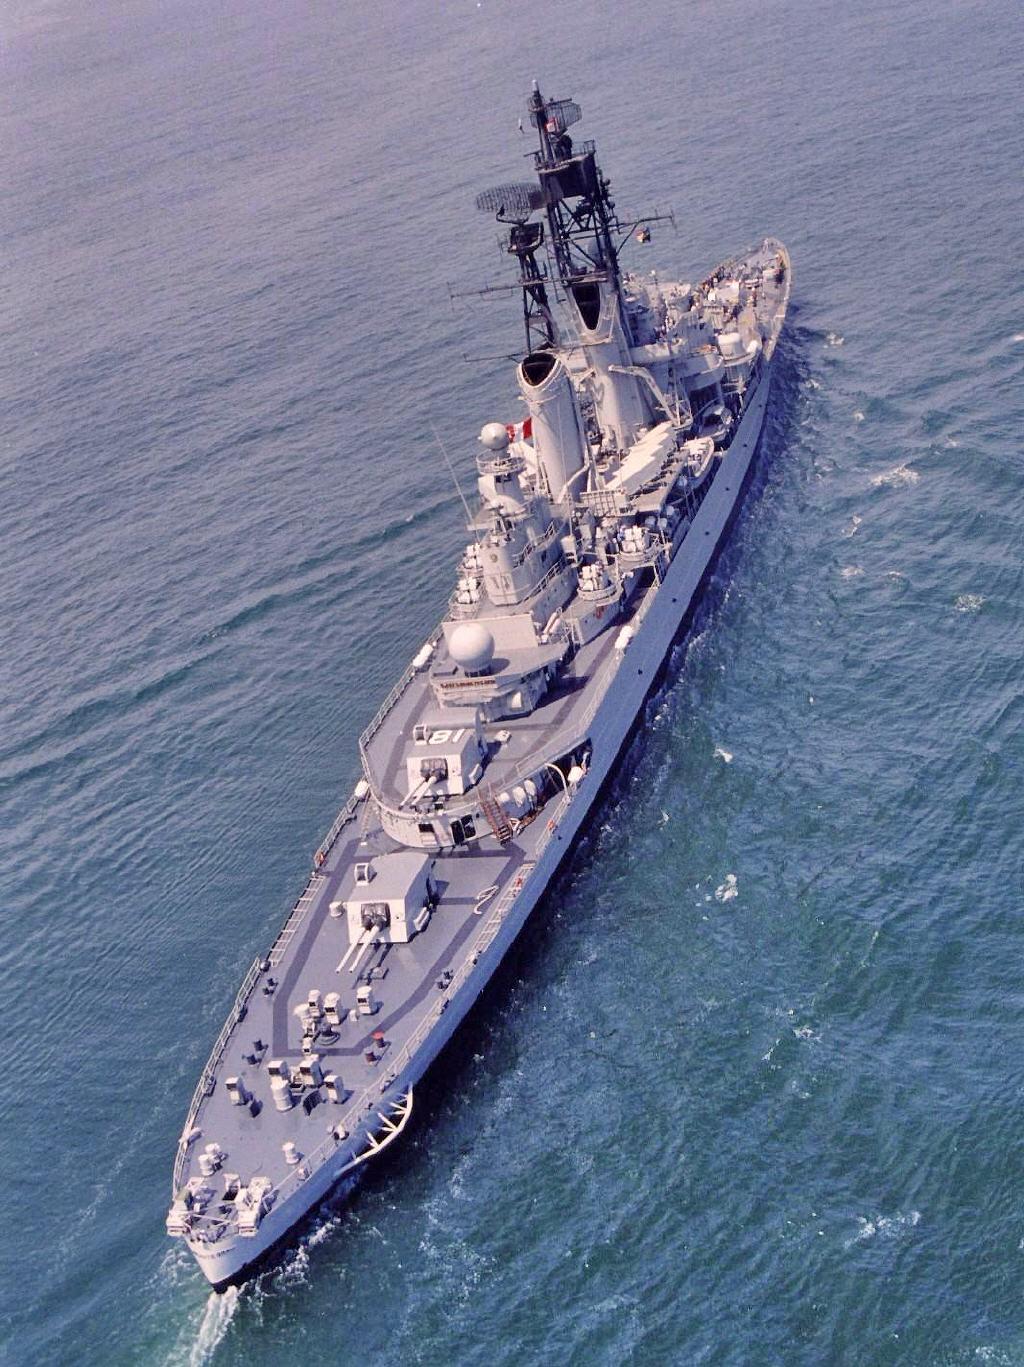 bap-almirante-grau-clm-81-2